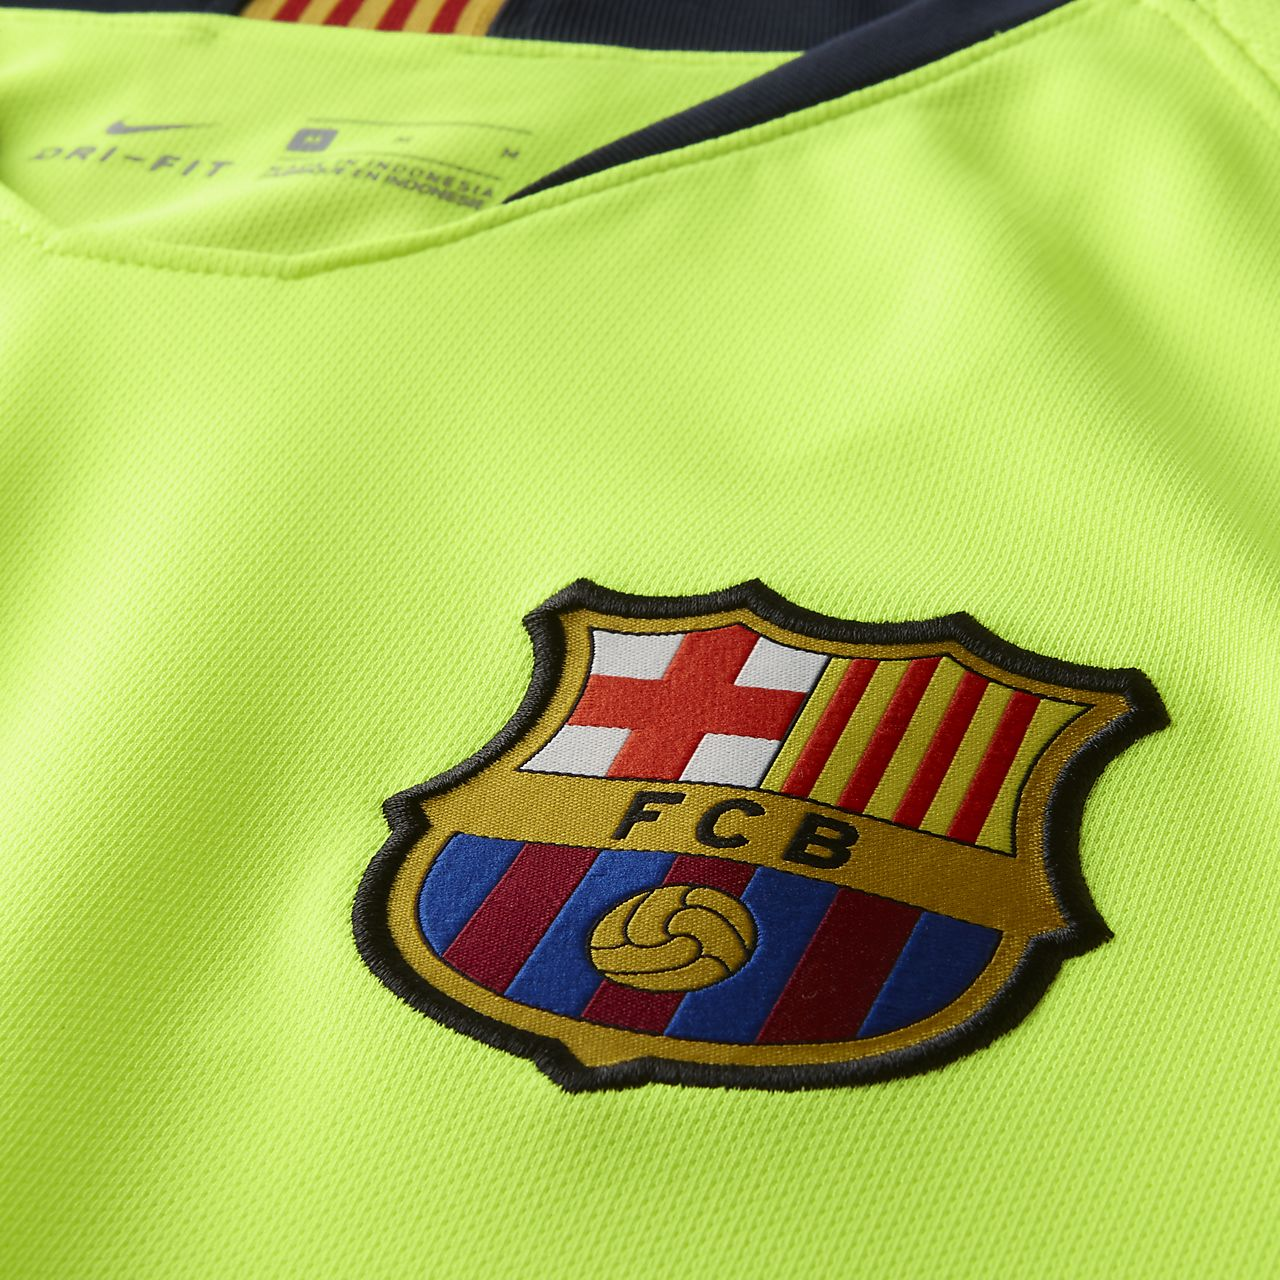 2b8c0d5a2 ... Camisola de futebol de manga comprida 2018 19 FC Barcelona Stadium Away  para homem